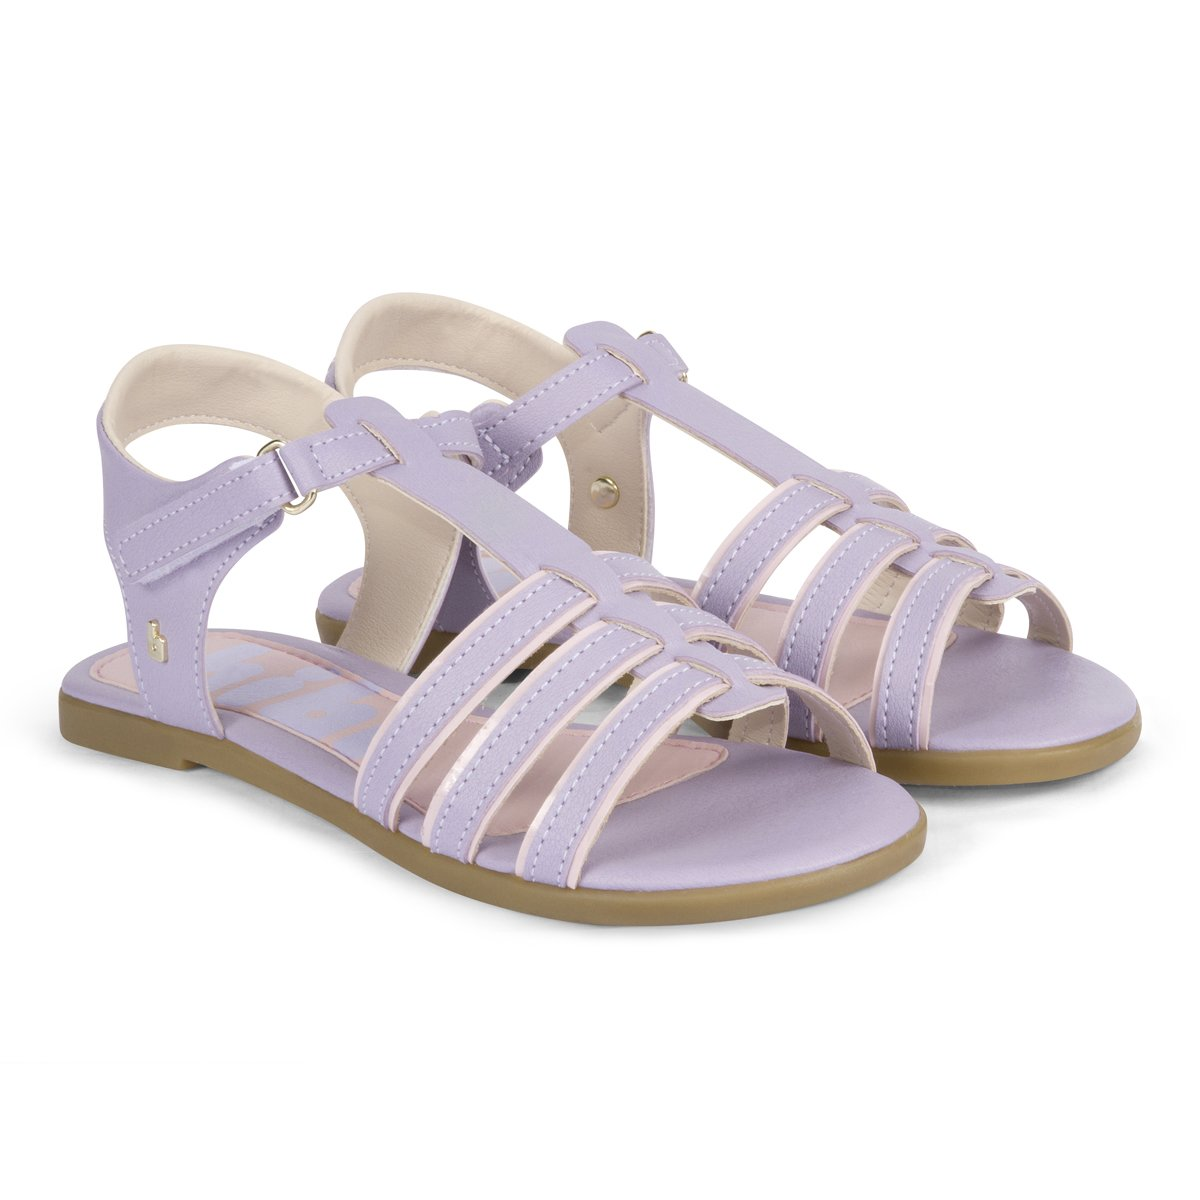 Sandale din piele Bibi Shoes Fresh Astral, Mov